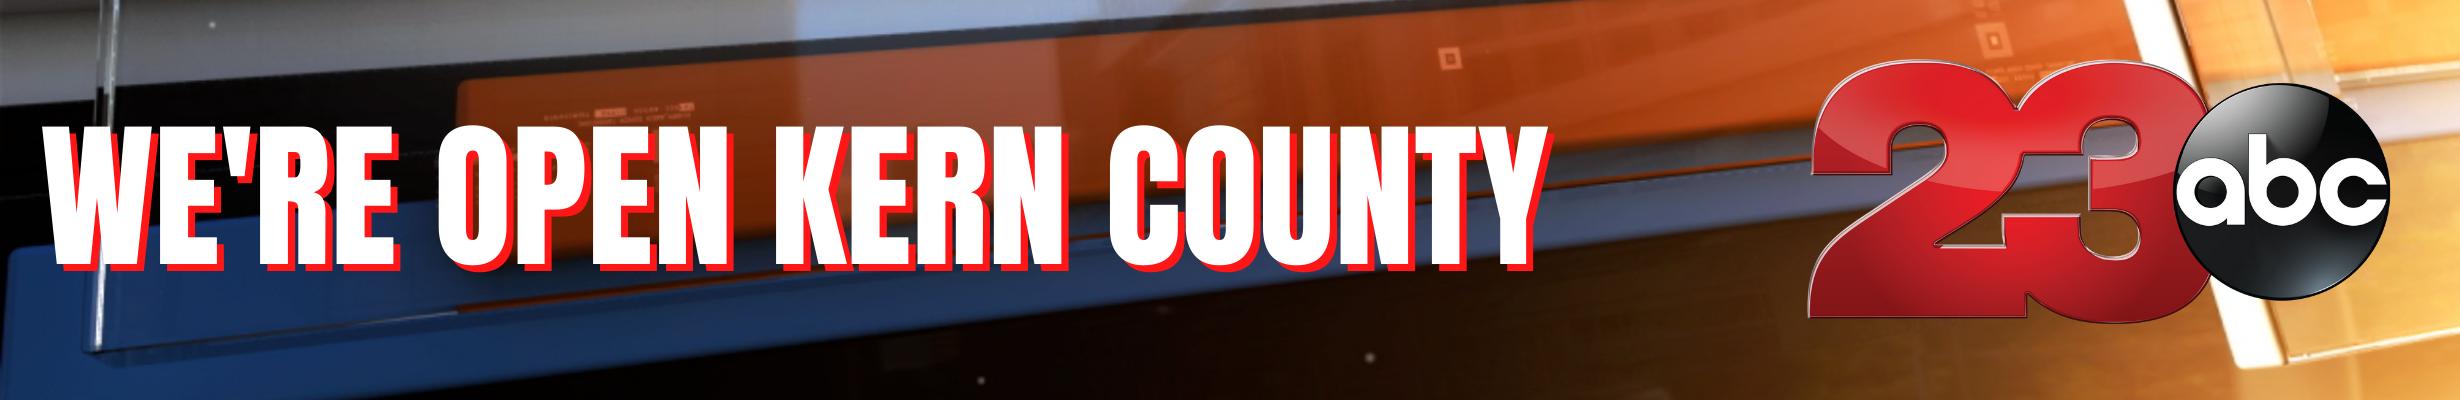 We're Open Kern County